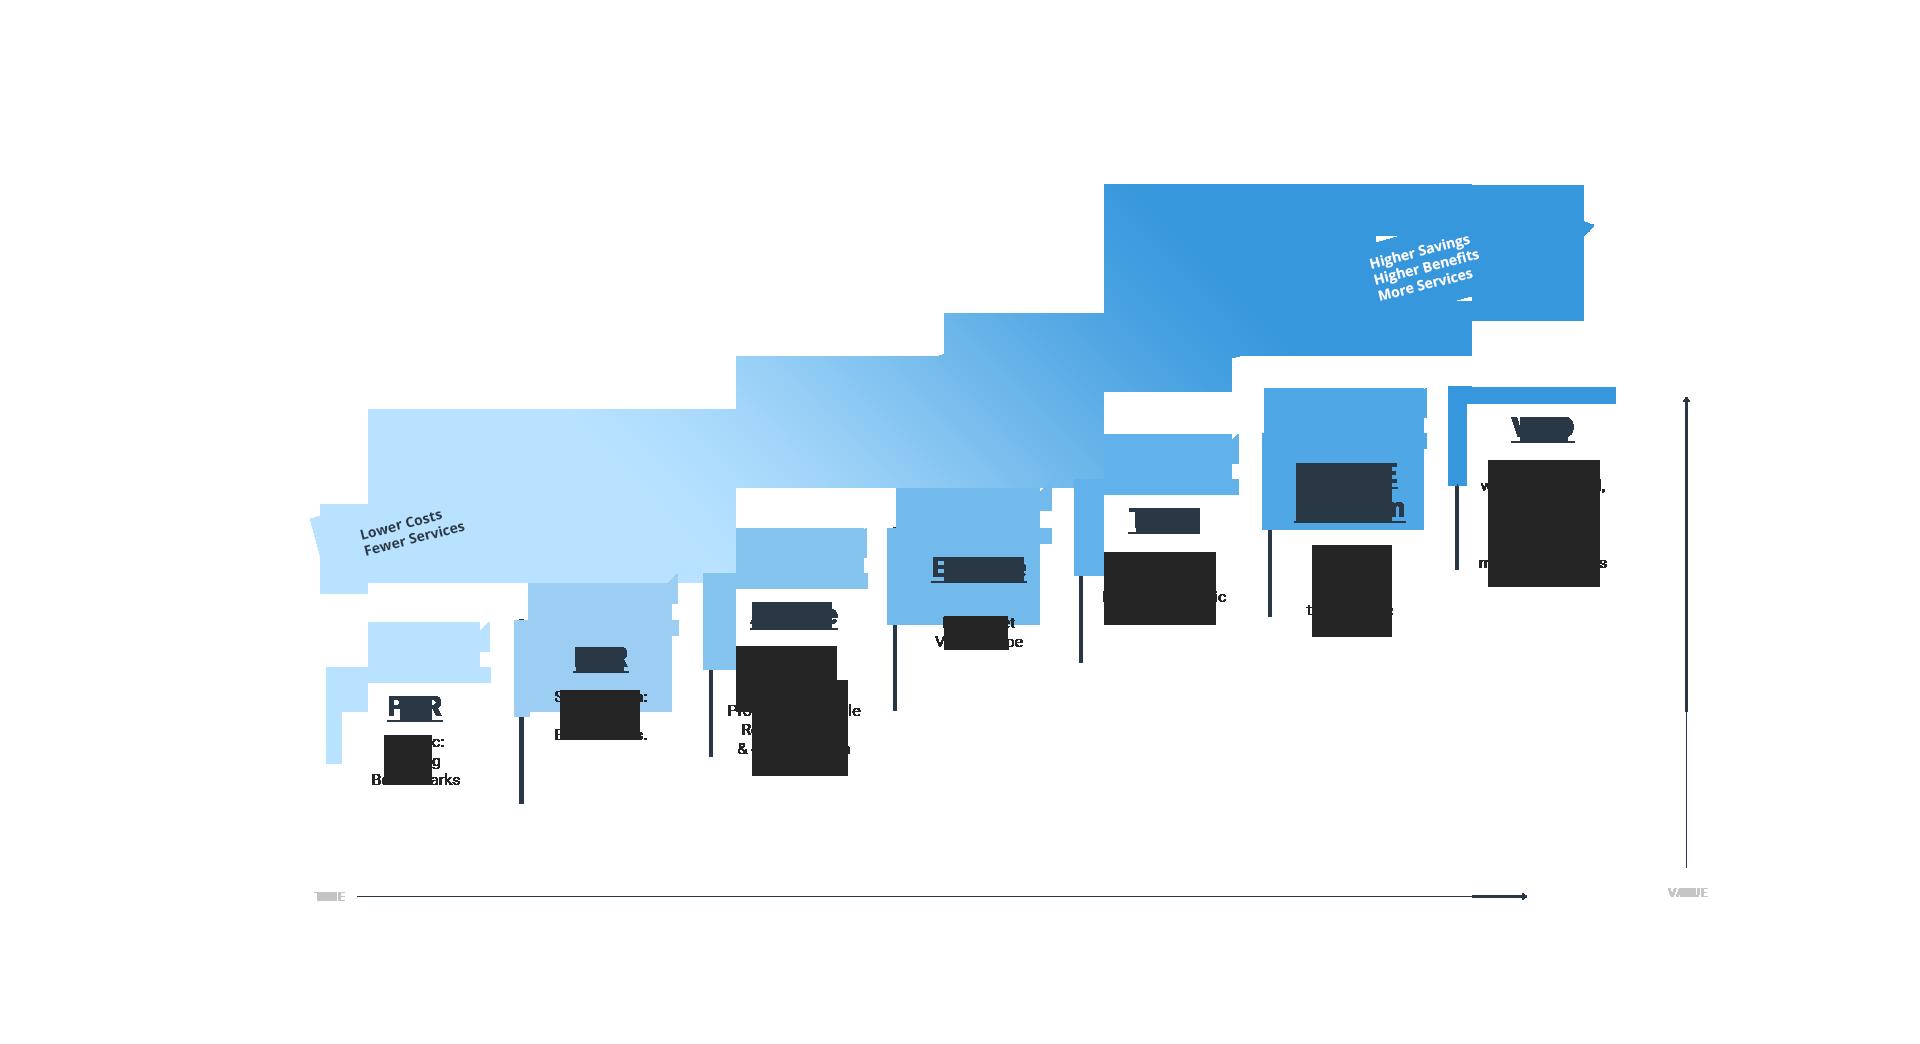 netnetweb_egagement_graph.png